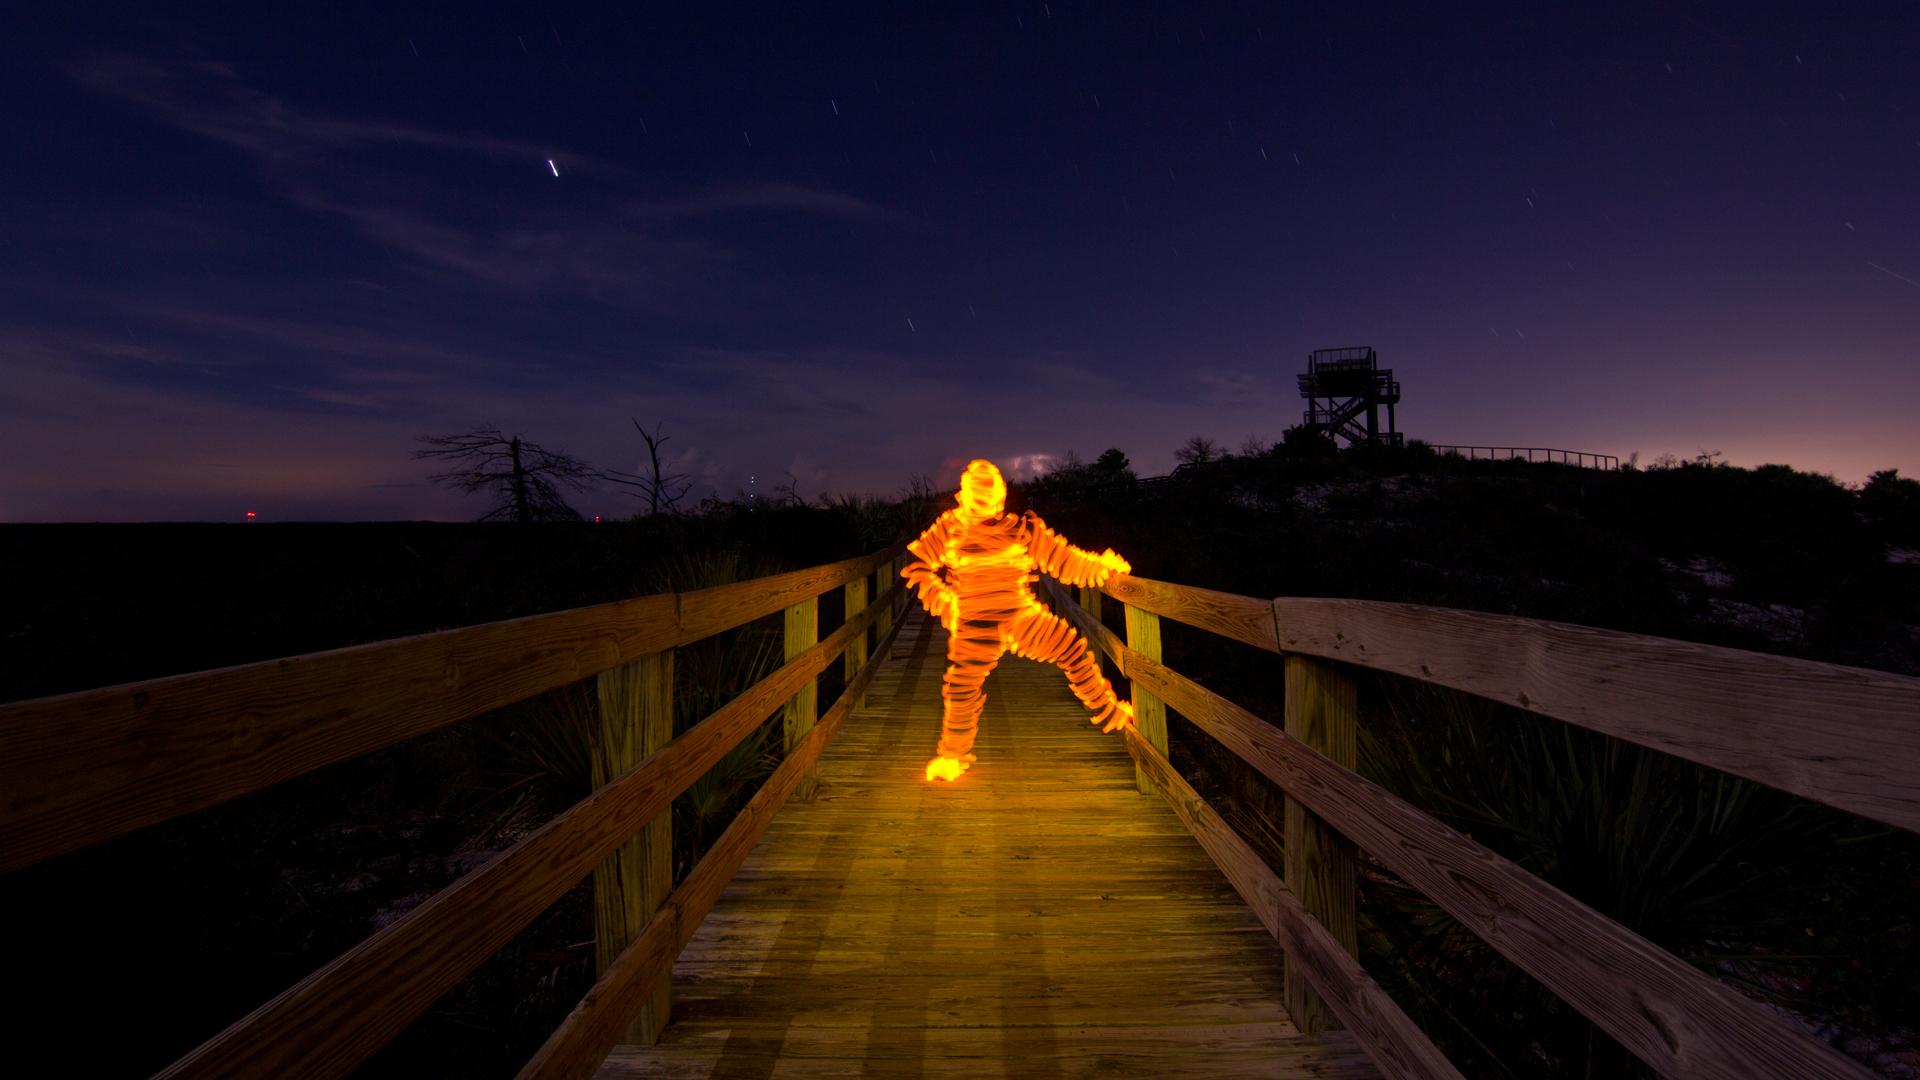 lightman-on-tower